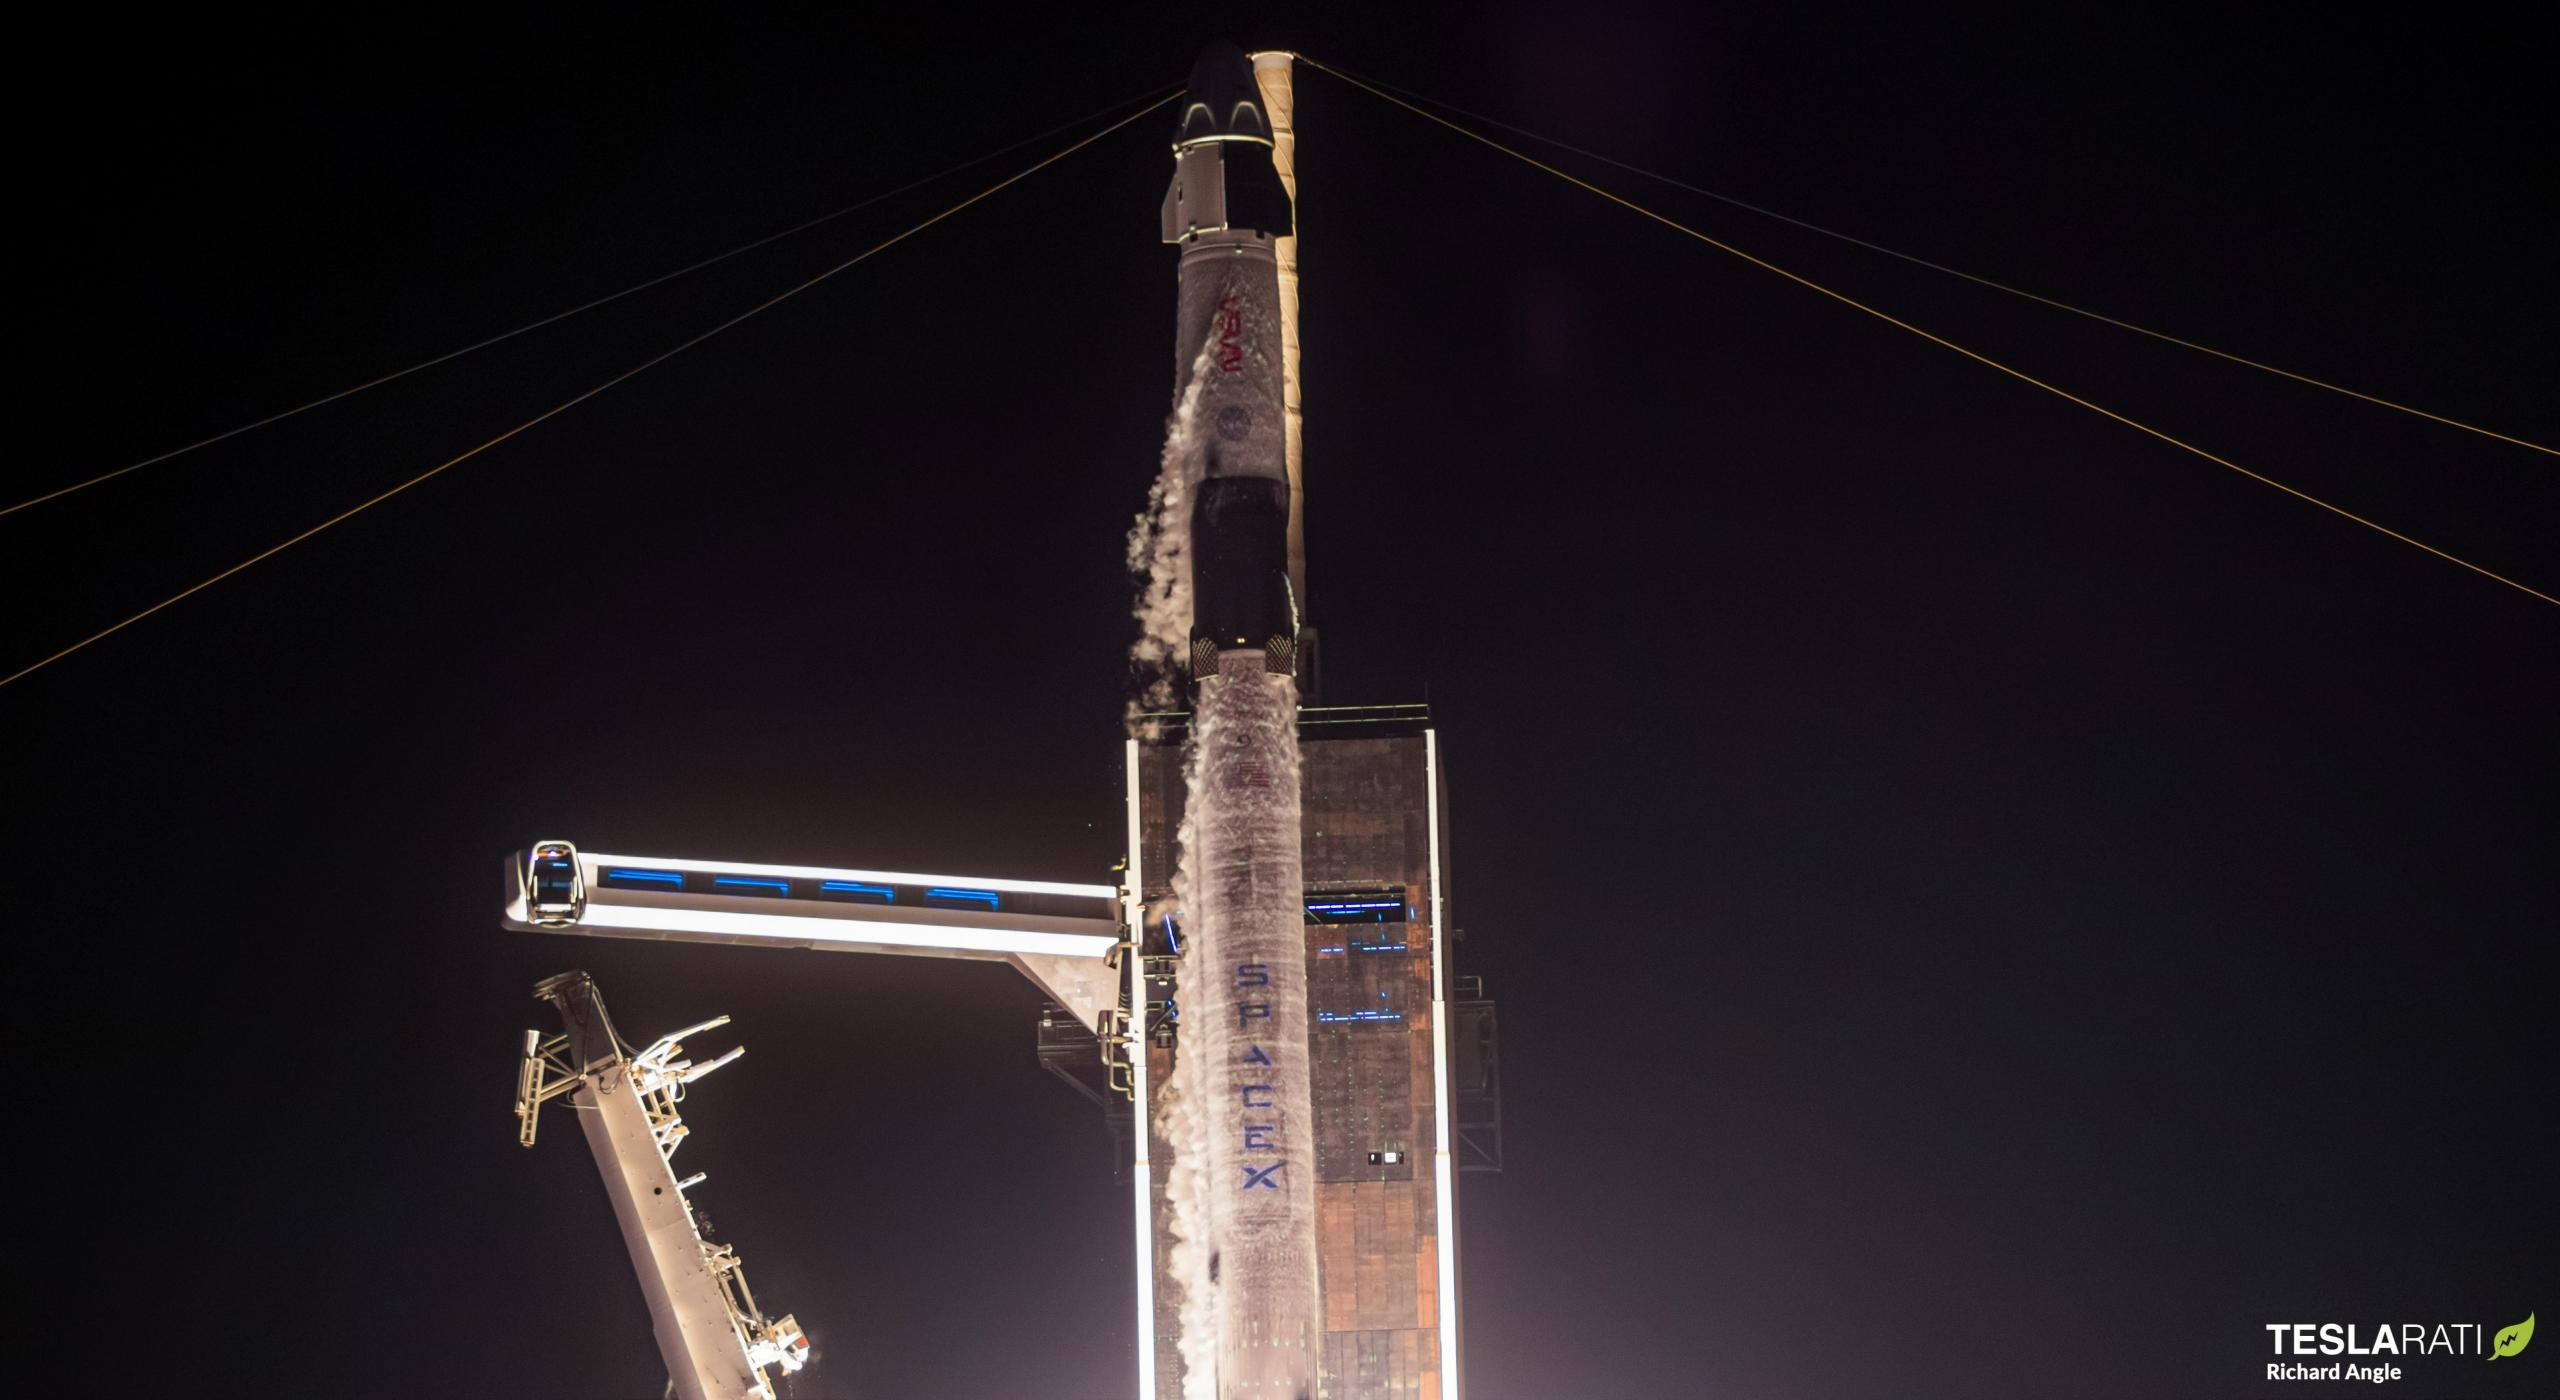 Crew-2 Crew Dragon C206 Falcon 9 B1061 39A 042321 (Richard Angle) launch 3 (c)